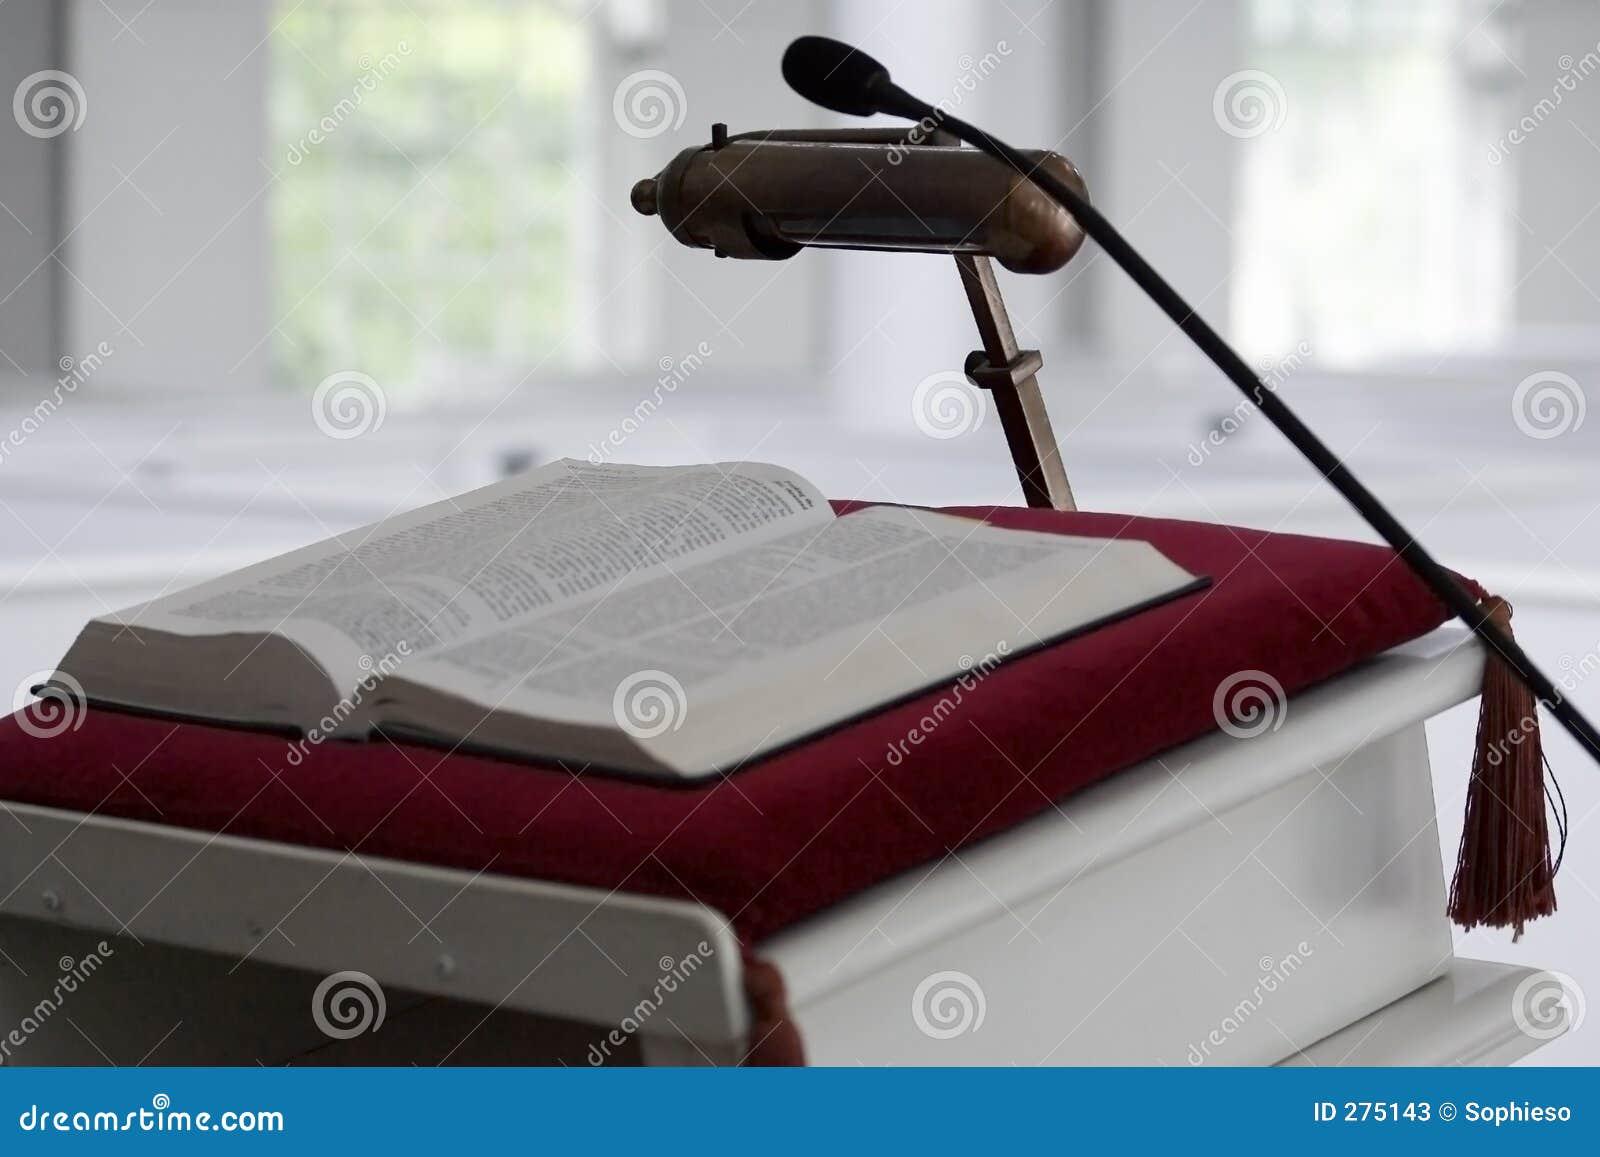 Kościół ambona biblii